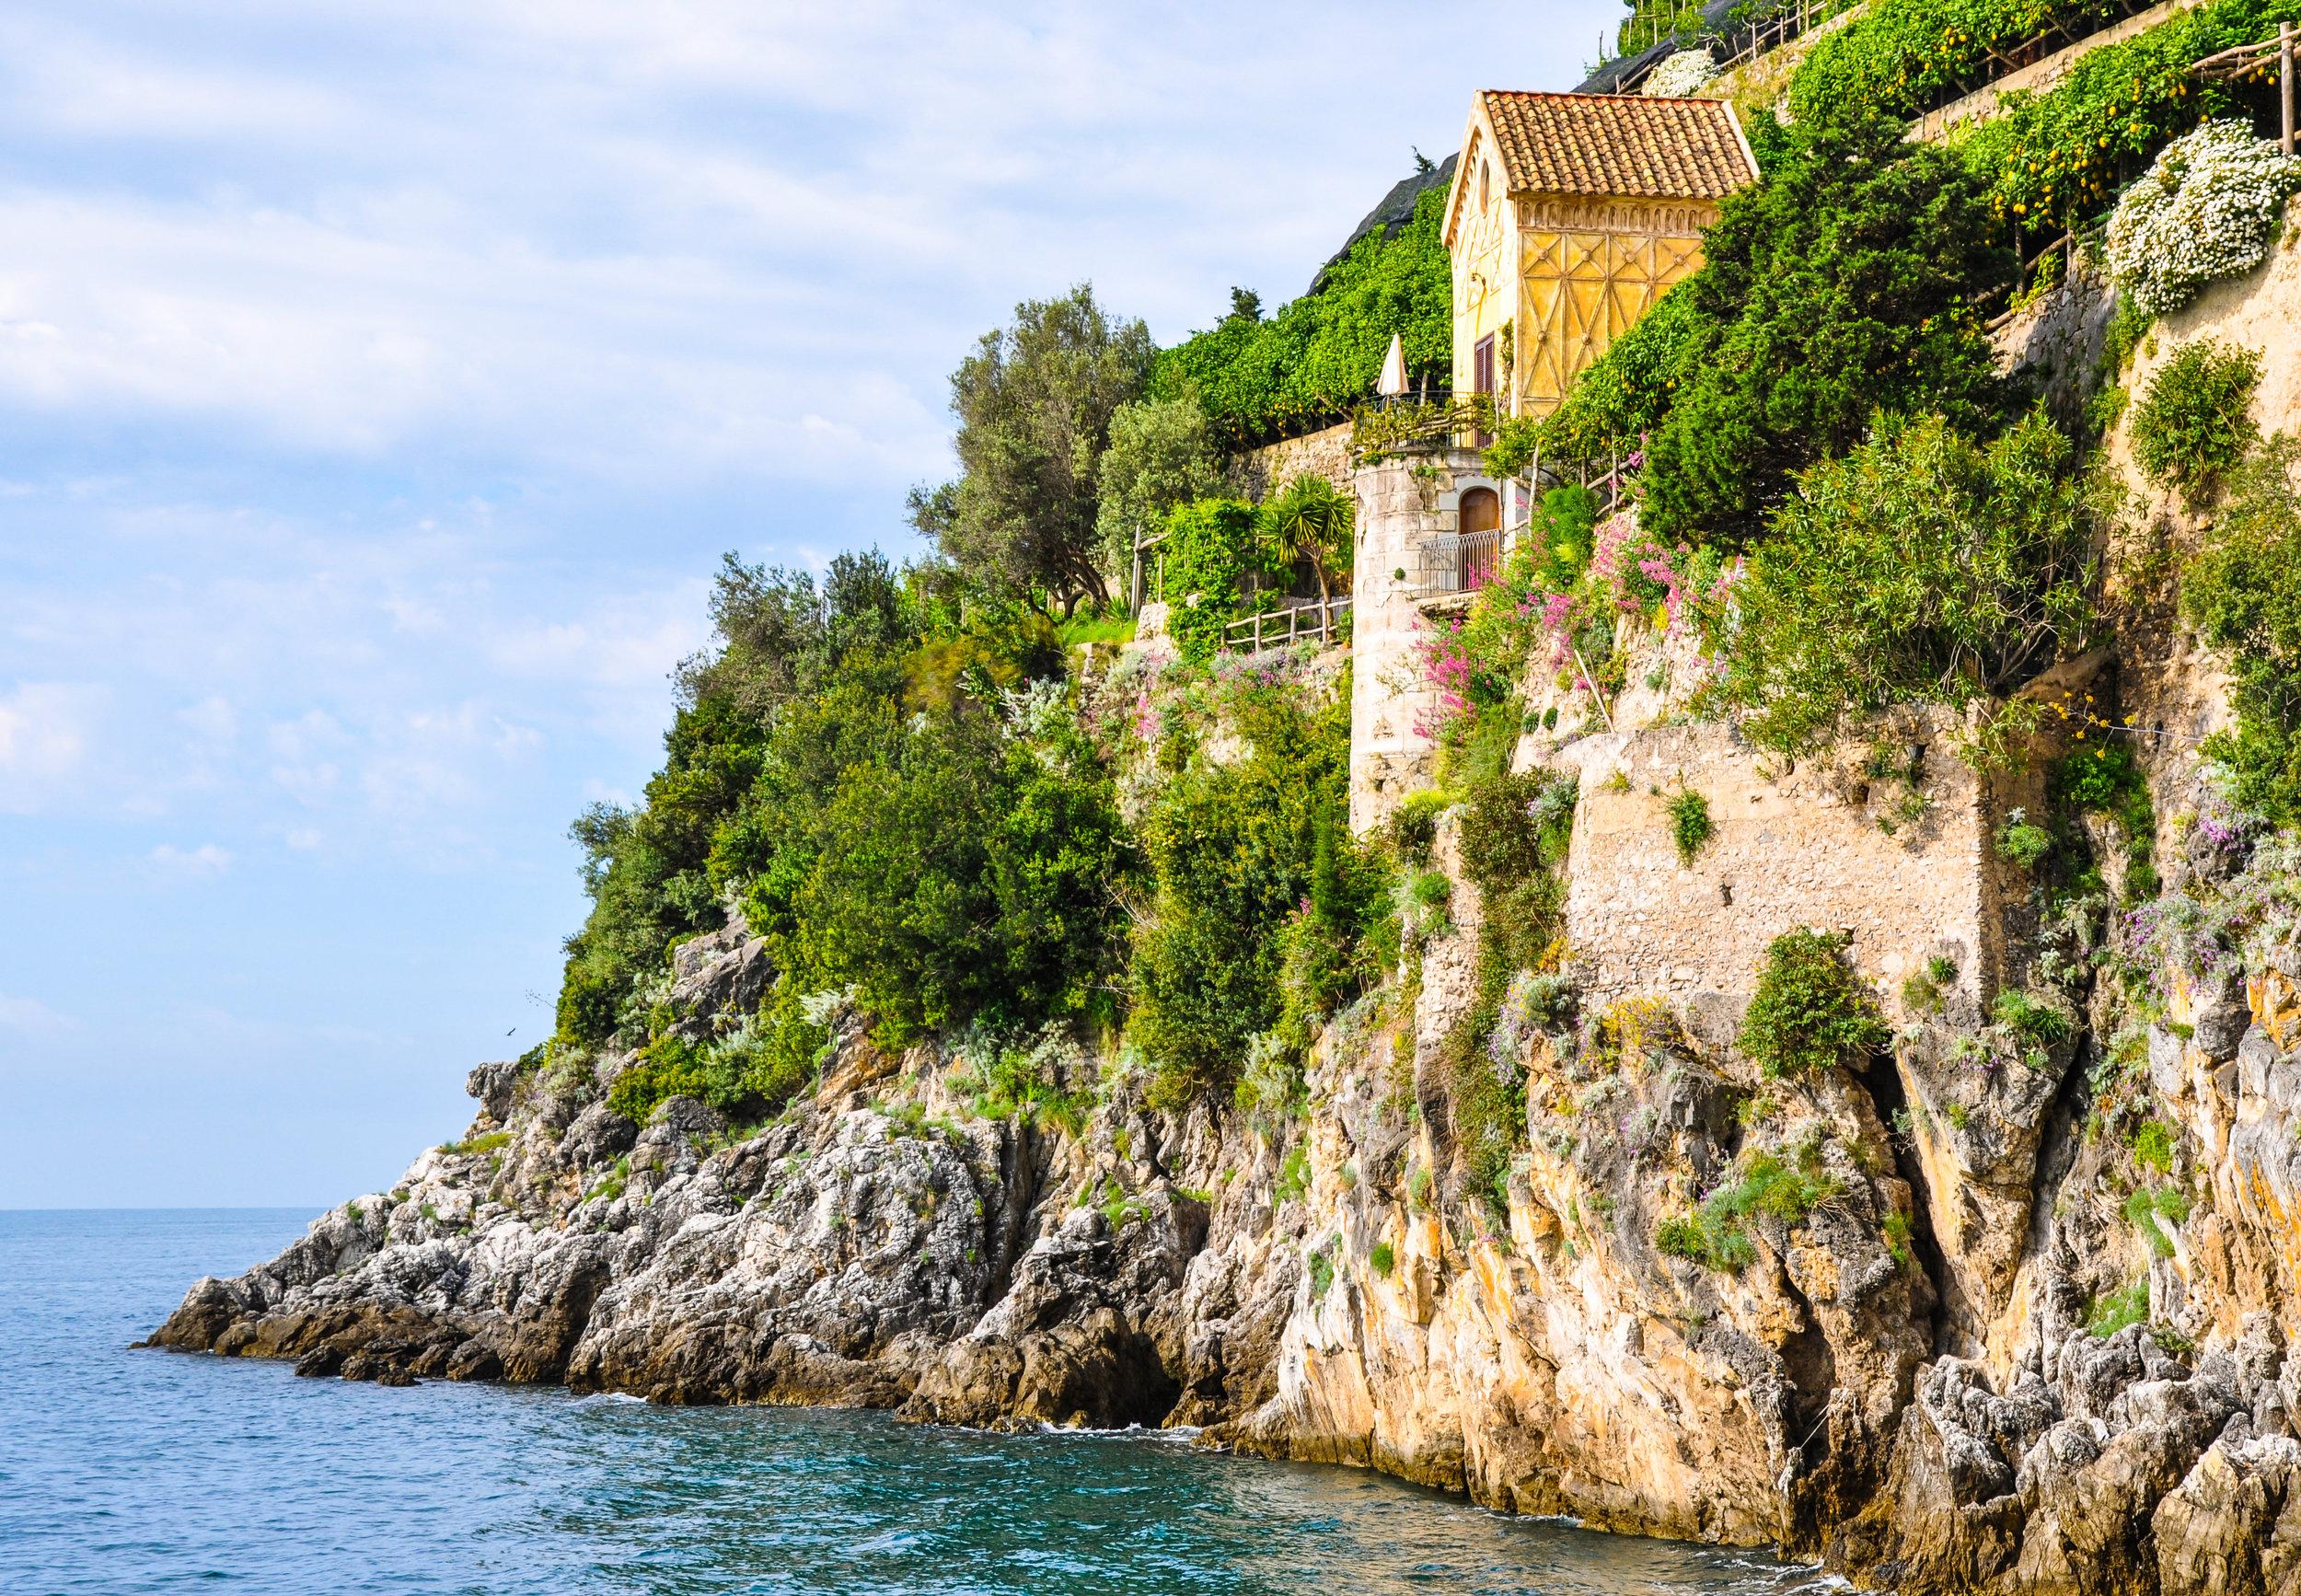 View my Rome, Amalfi Coast, Pompeii & Herculaneum Album